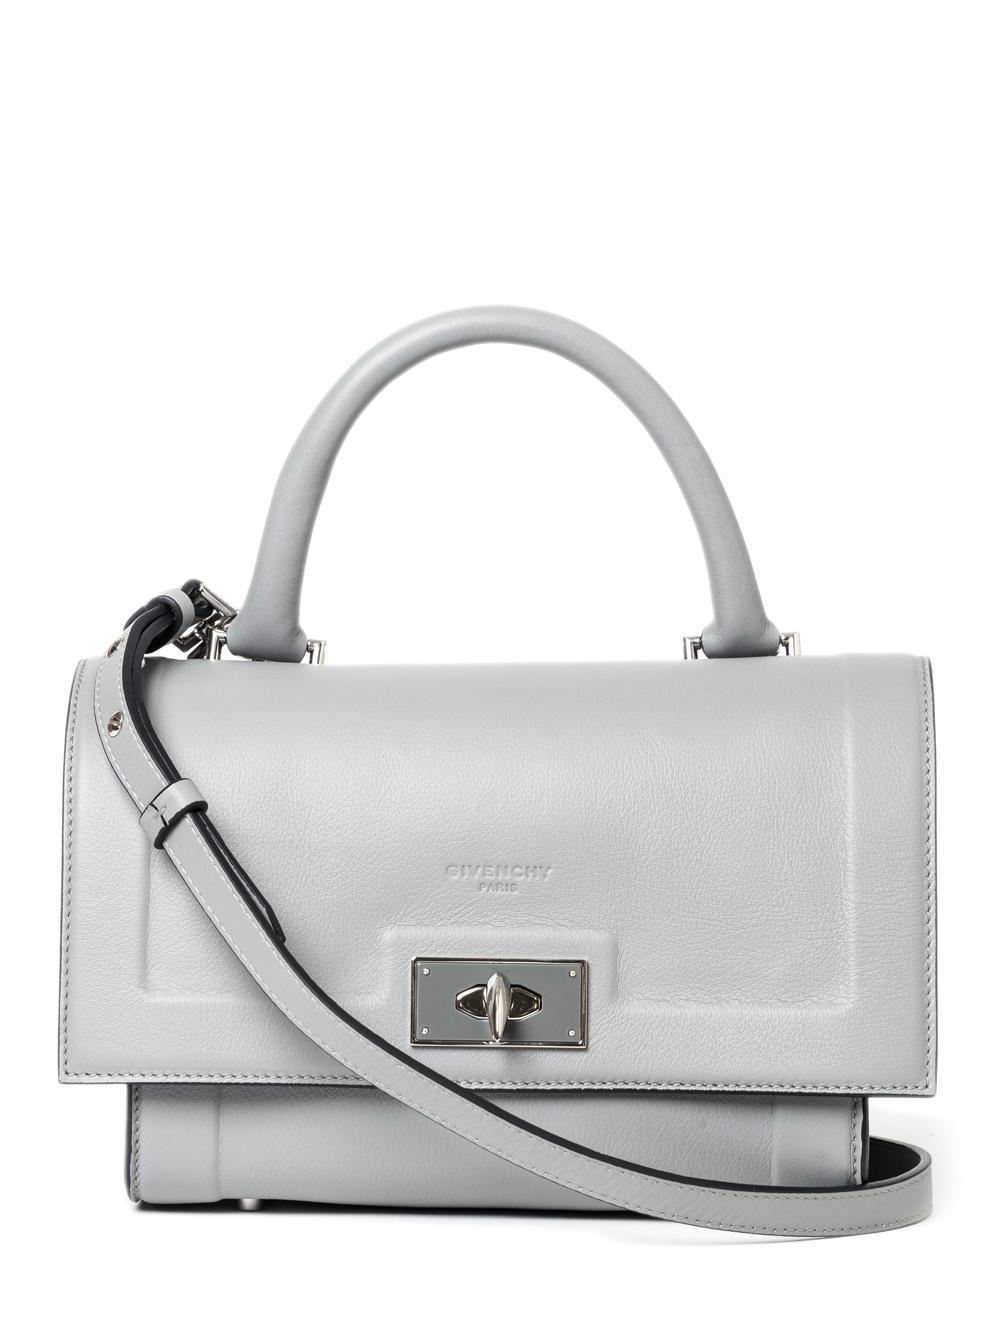 a3dd981fcd92 Lyst - Givenchy Mini Shark Bag in Gray